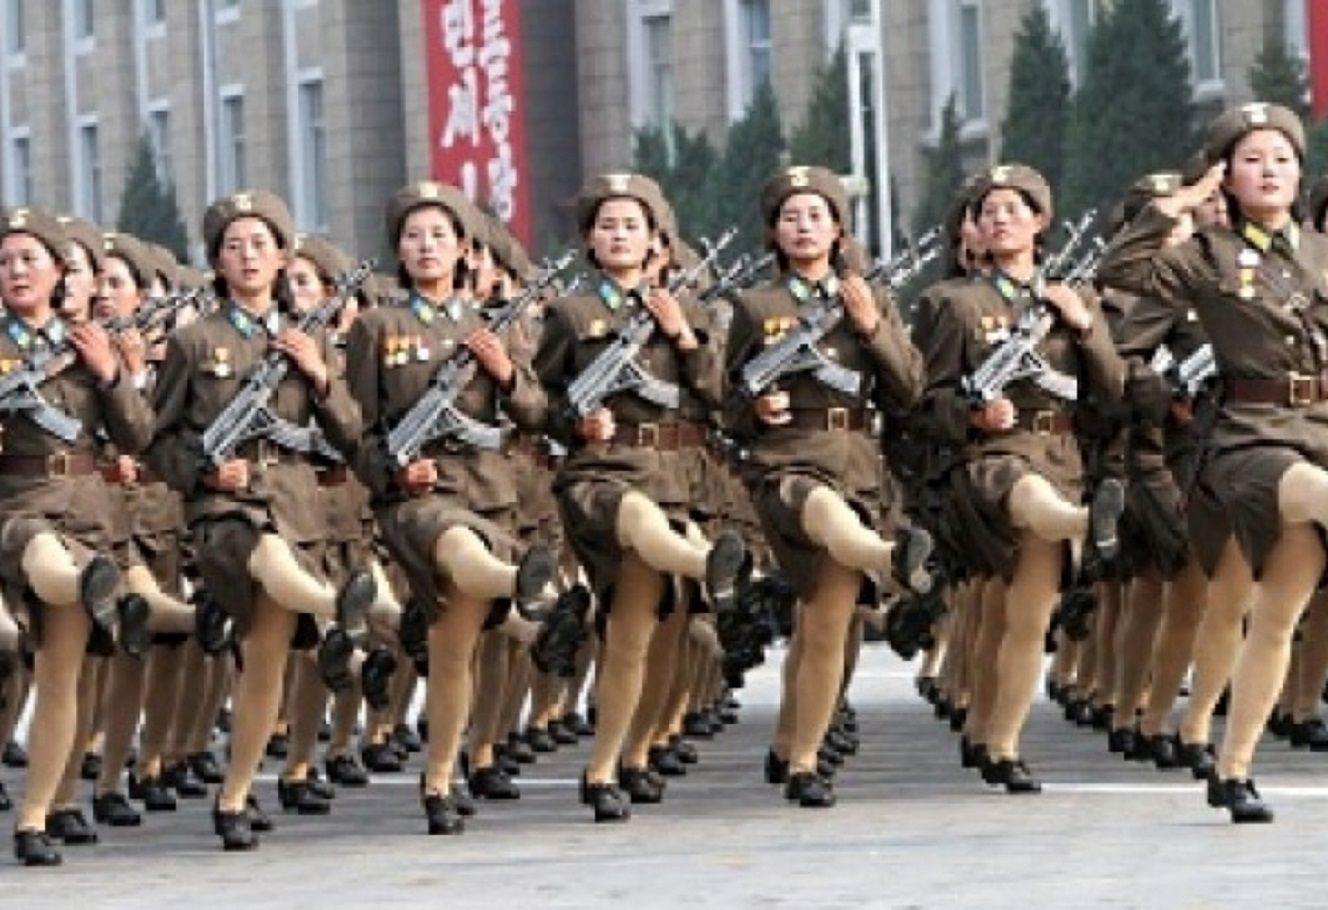 403 Forbidden Womens Hairstyles North Korea North Korea Facts